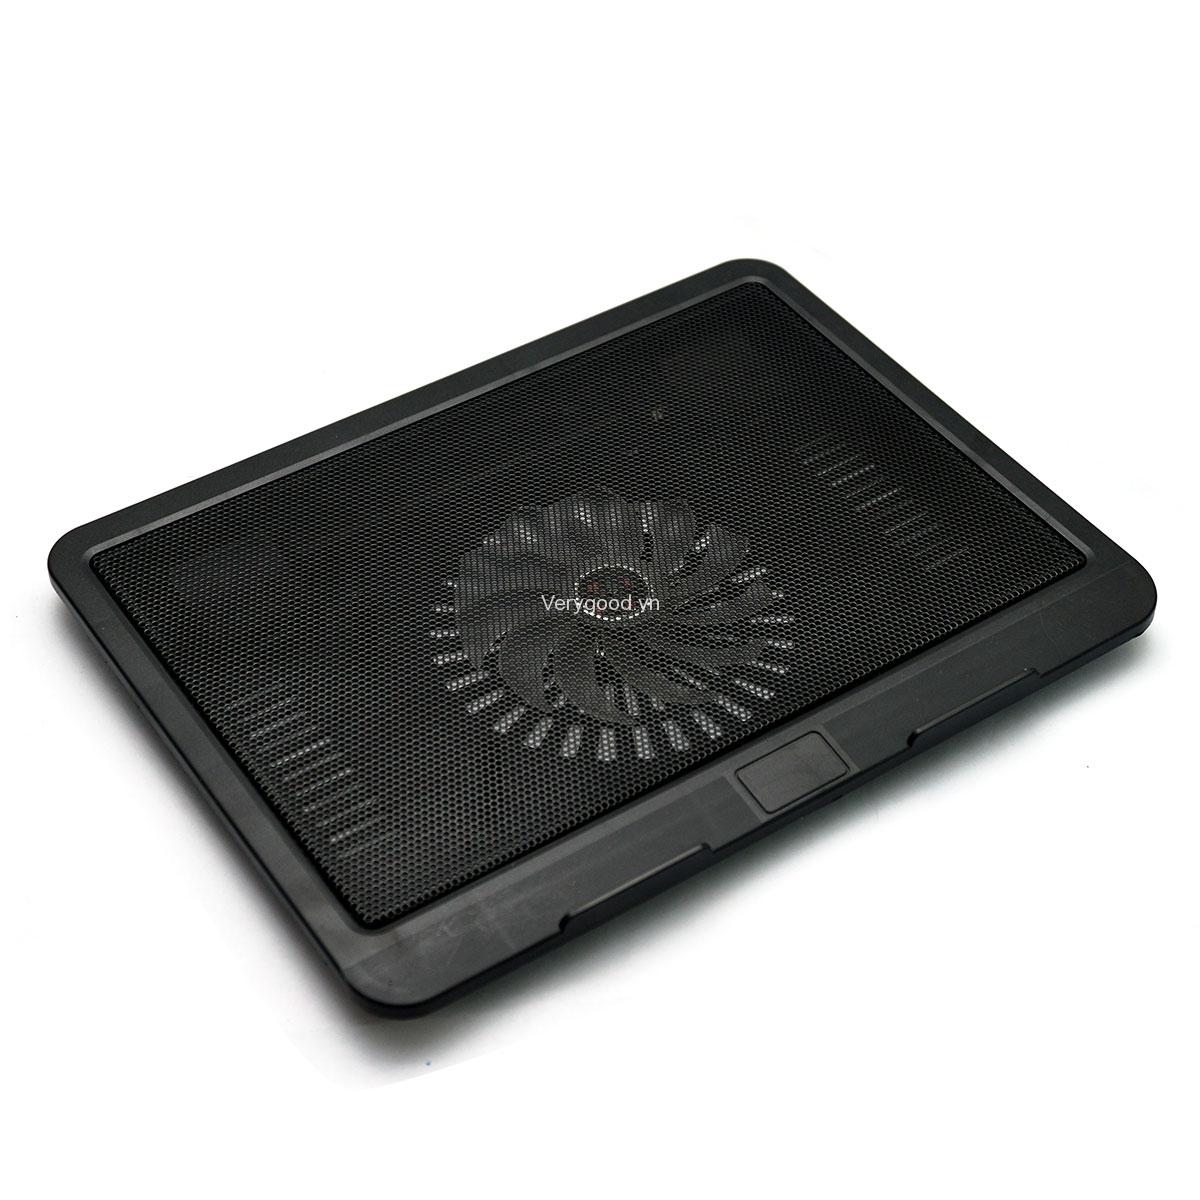 de-tan-nhiet-Laptop-N191